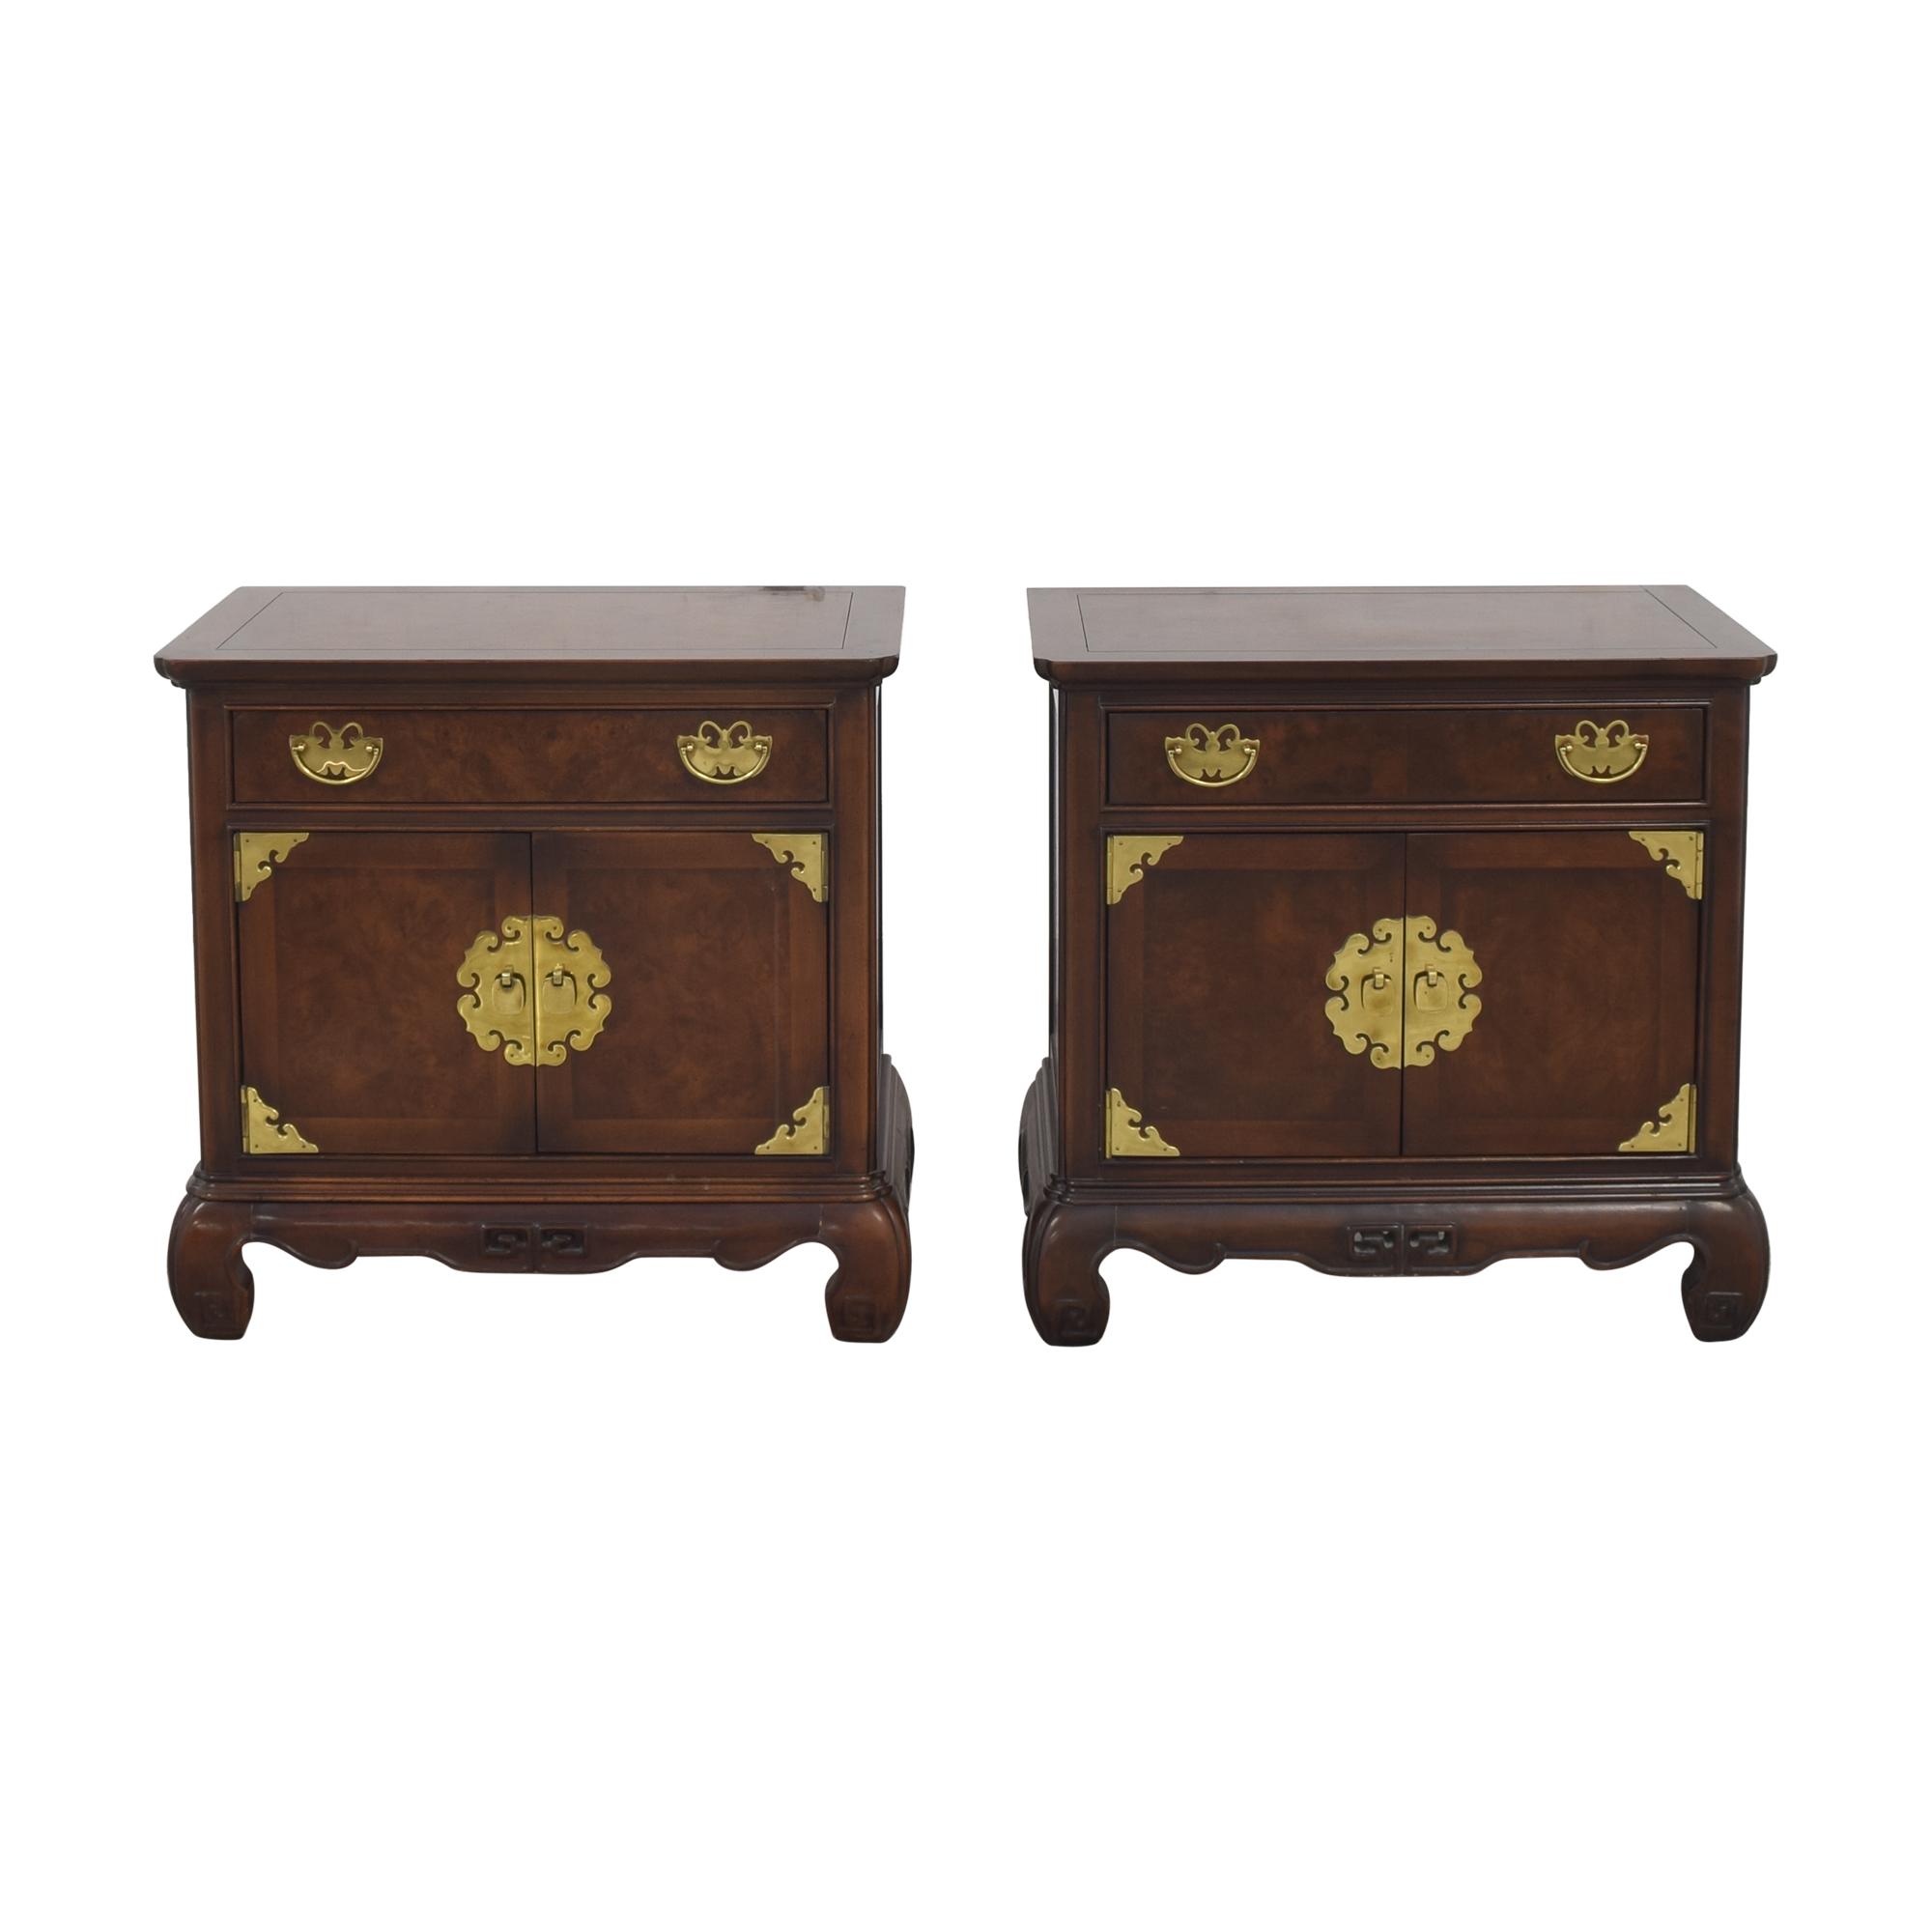 Drexel Heritage Drexel Heritage Ming Treasures Nightstands on sale